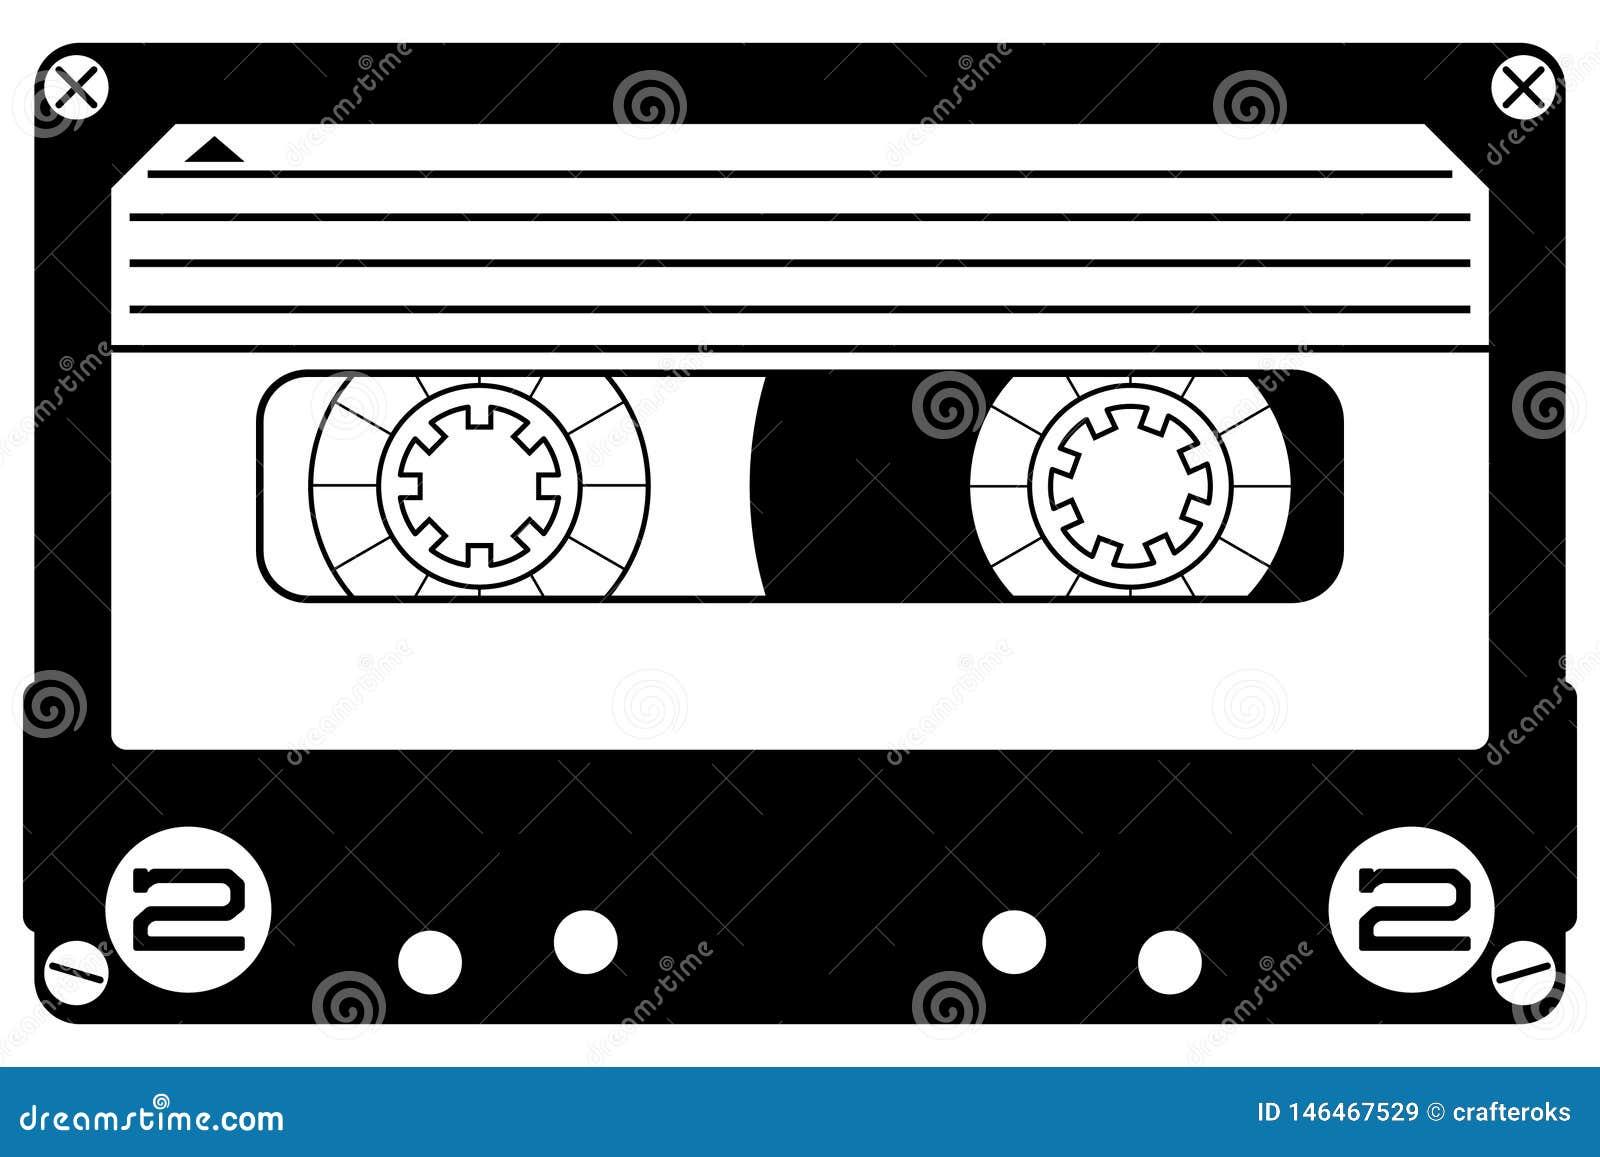 Cassette Mixtape Hand Drawn Crafteroks Svg Free, Free Svg